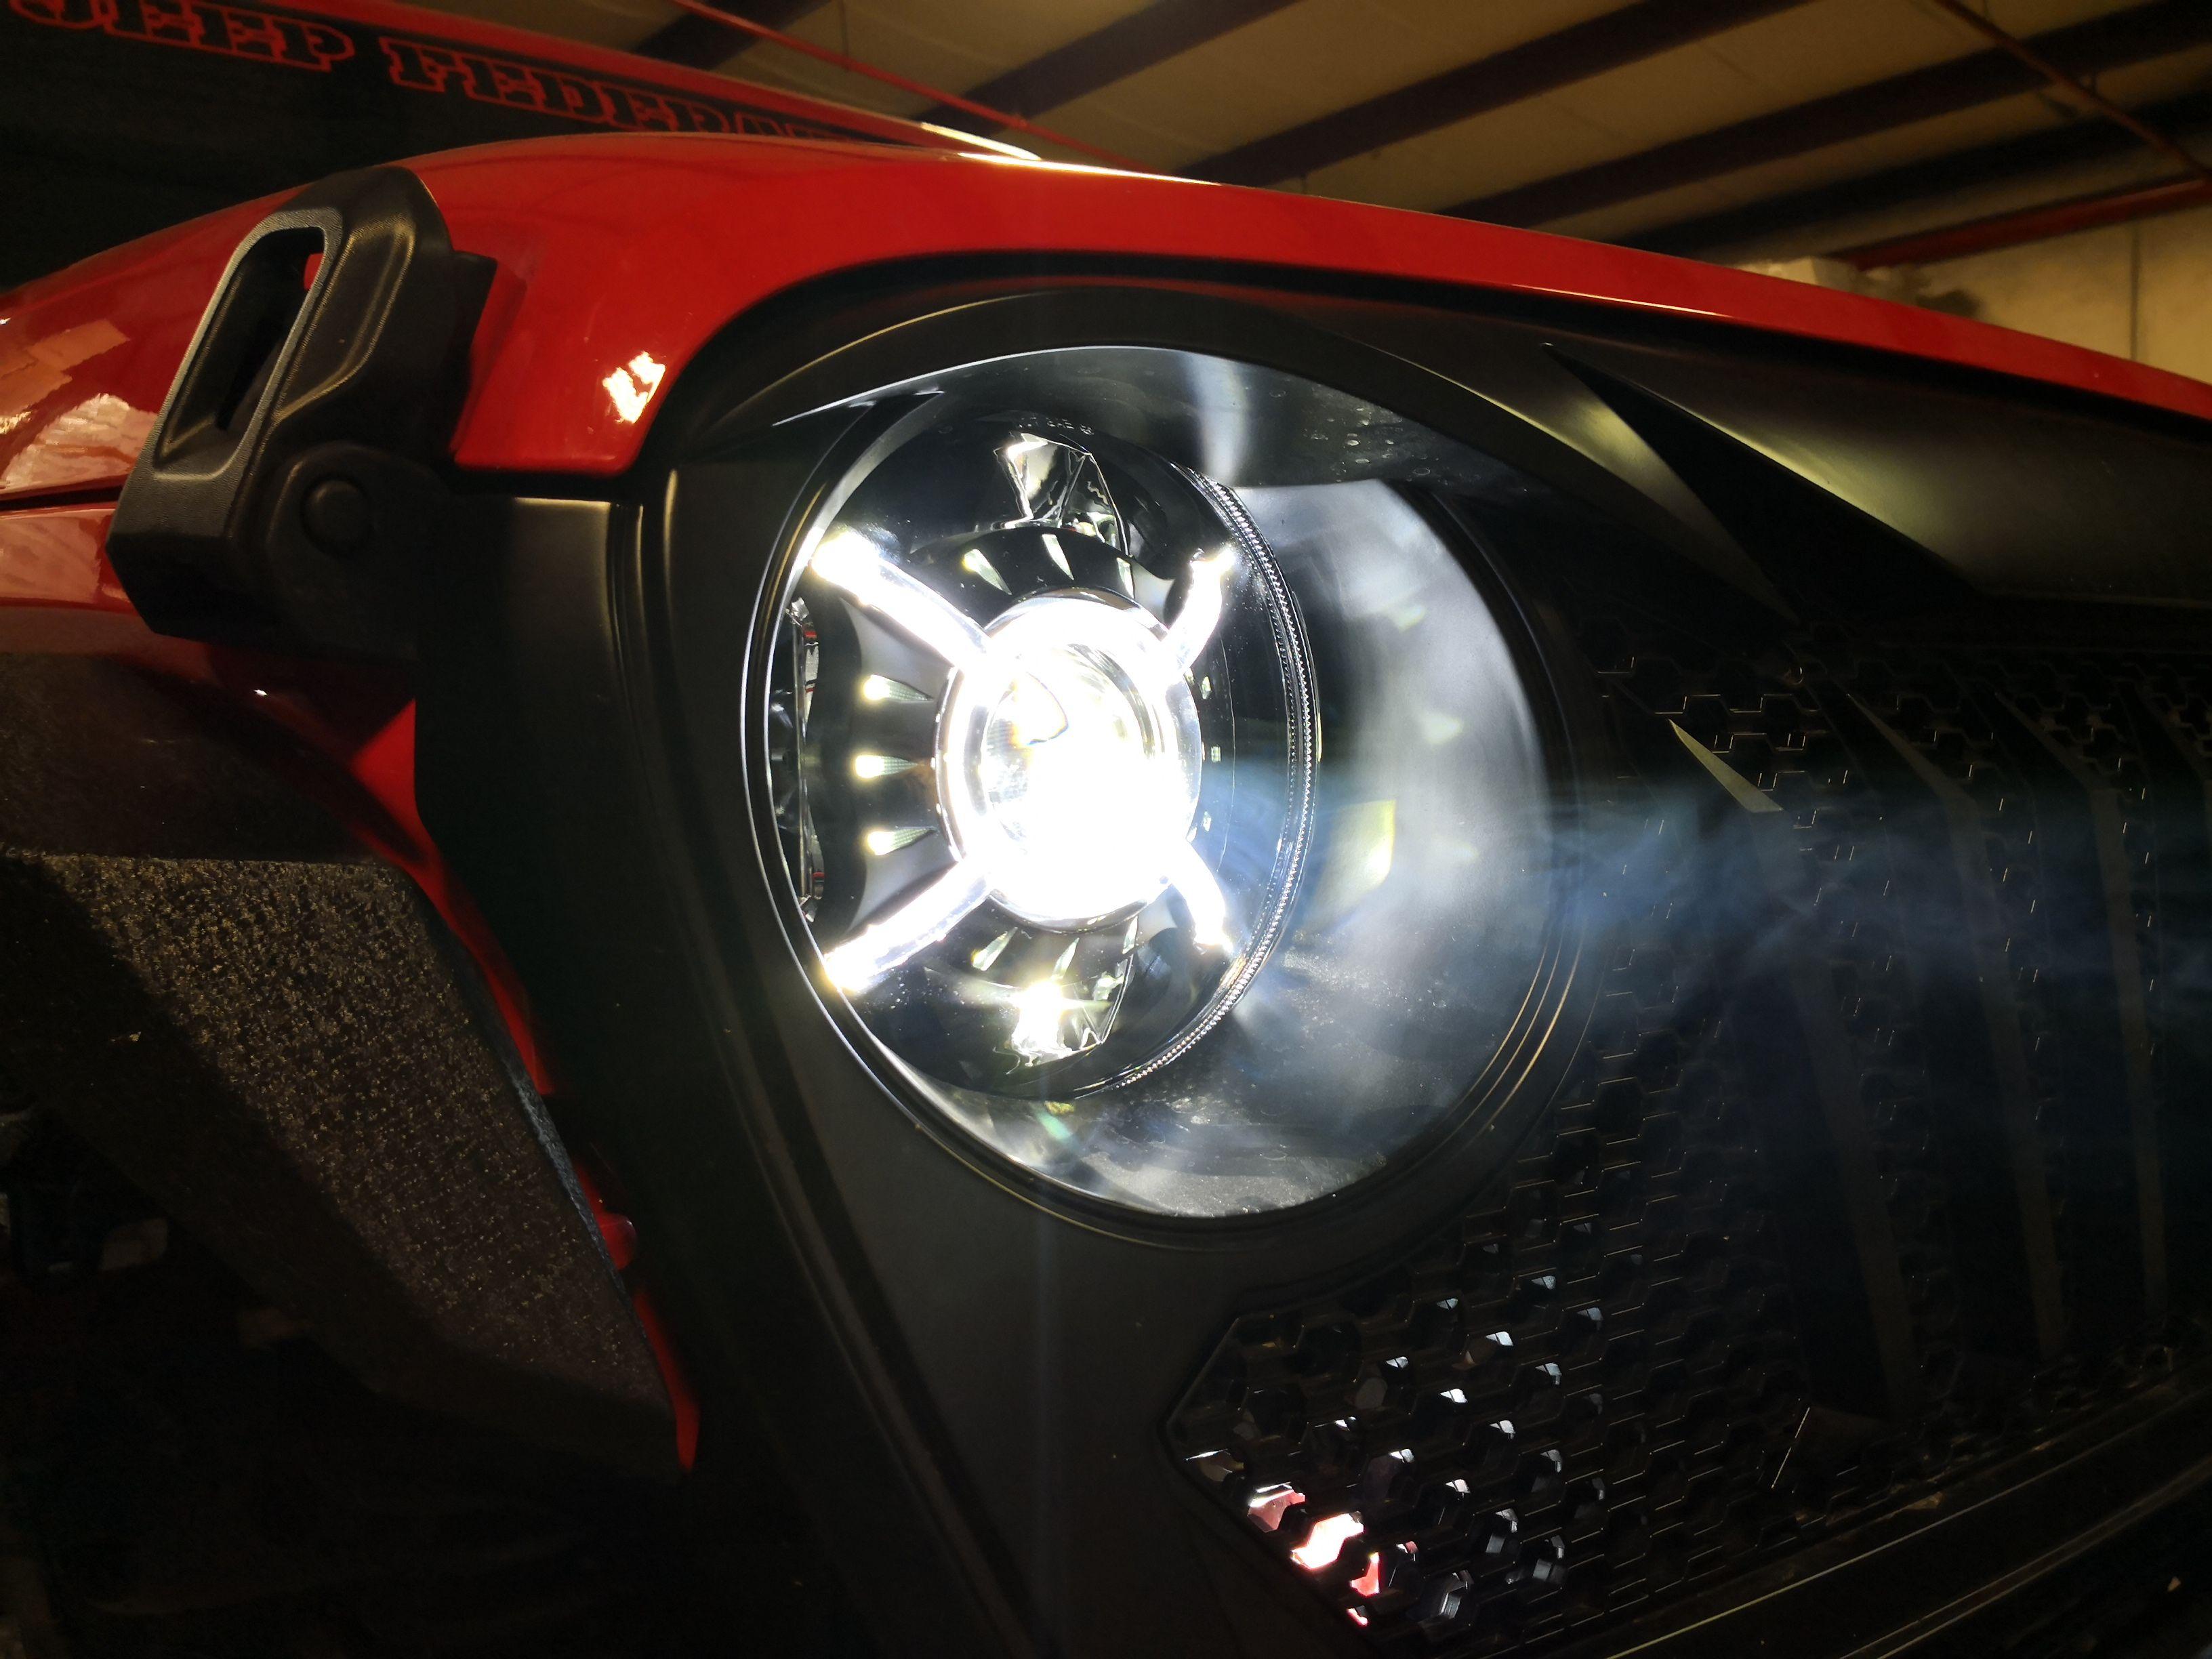 Cyclone Led Headlights For Wrangler Jl Gladiator 2018 Custom Headlights Wrangler Jl Led Headlights